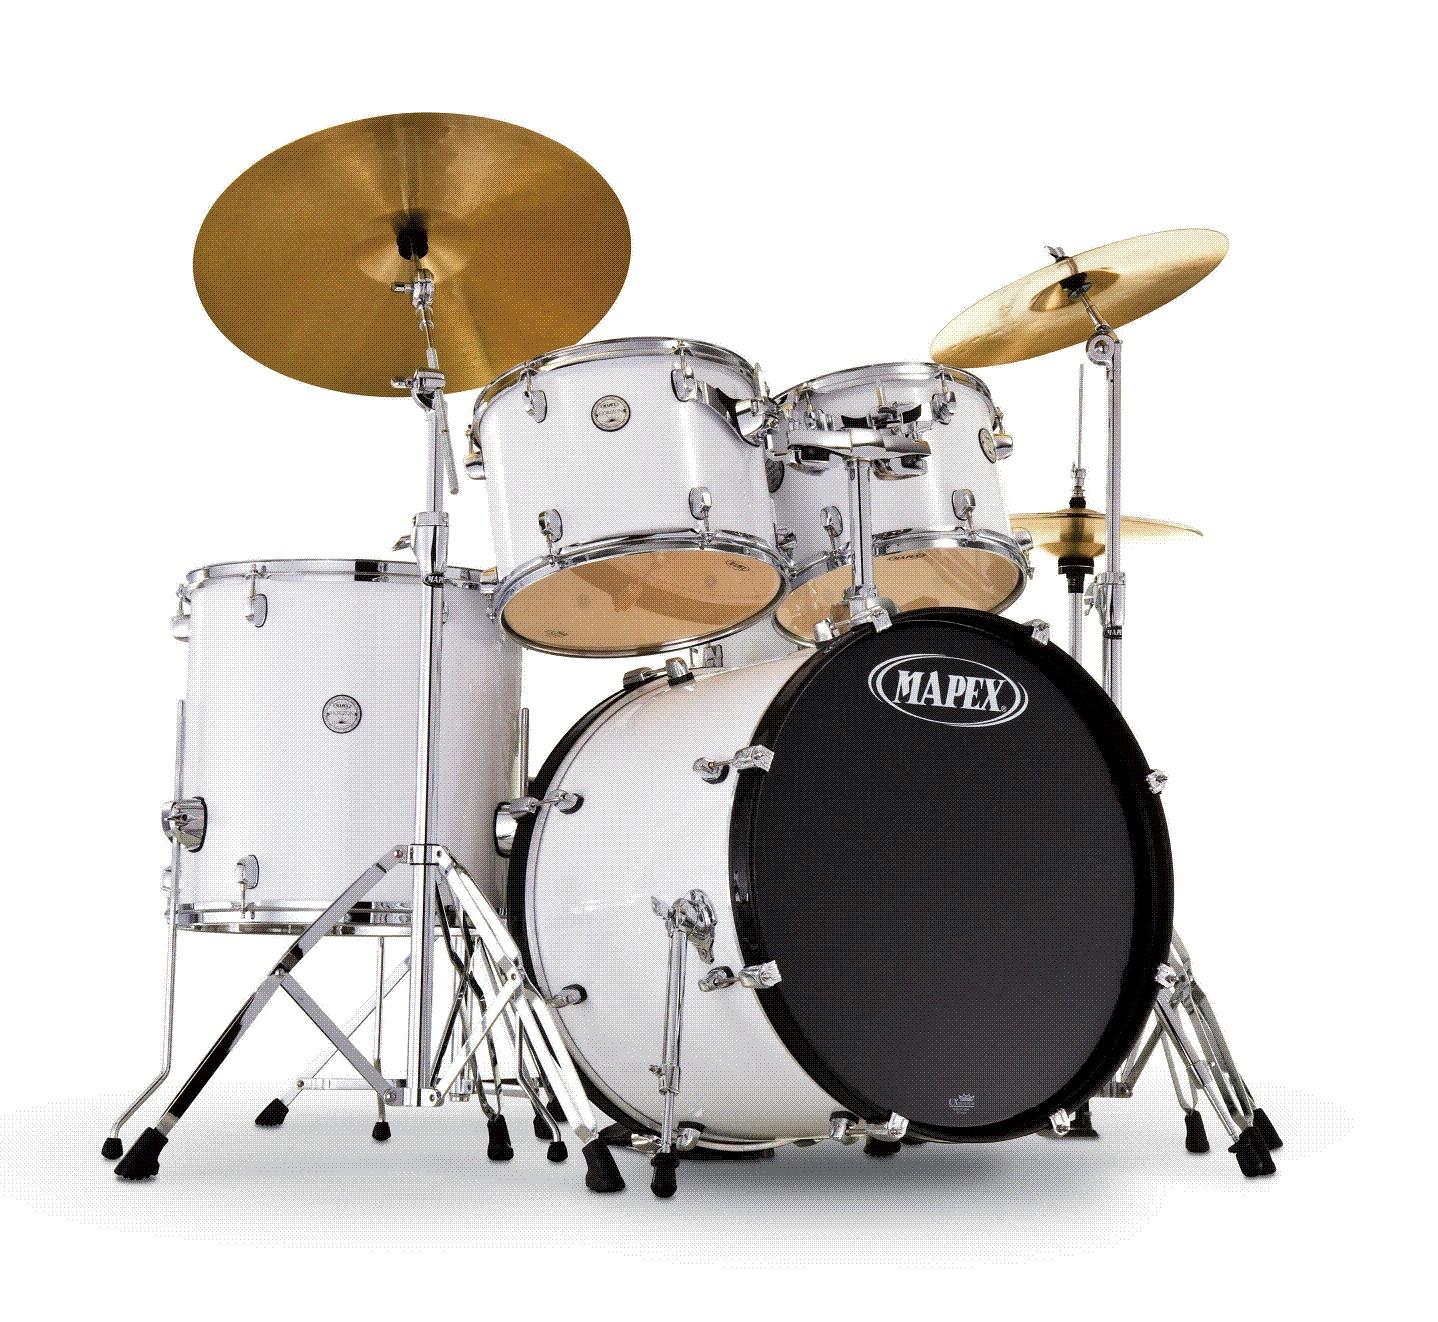 Mapex 2010 Horizon Drum Set News